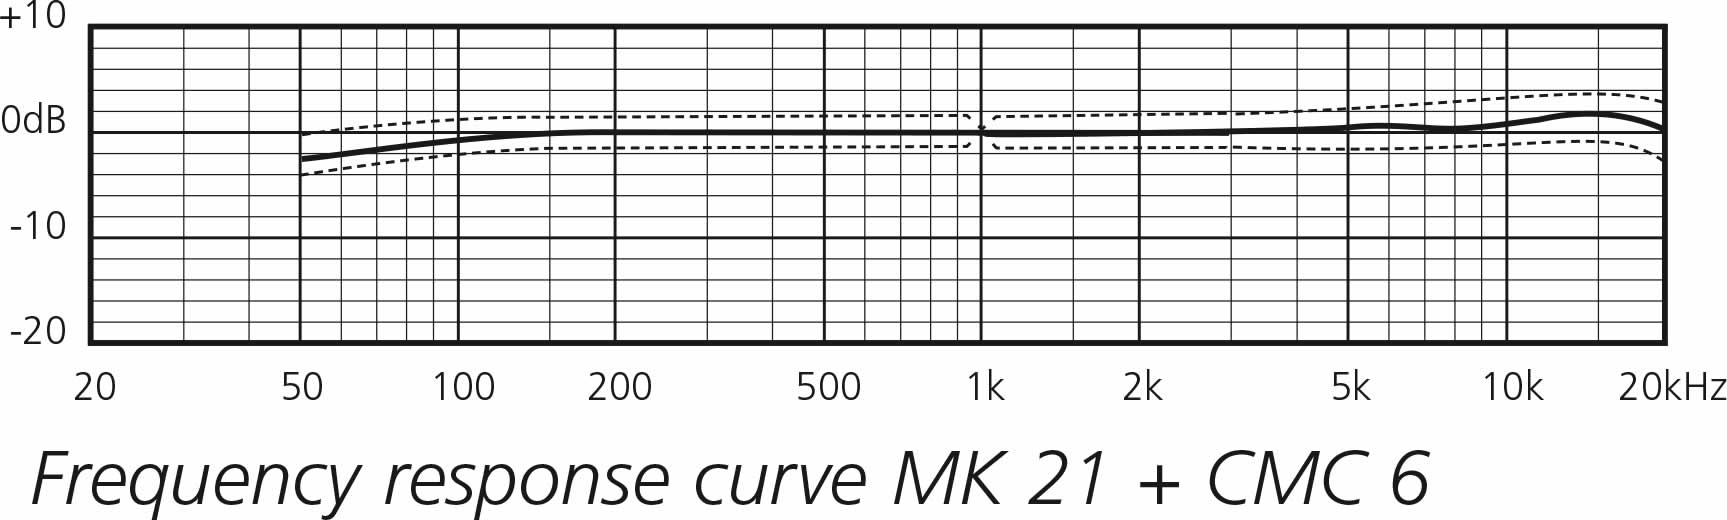 cmc6 + mk21g